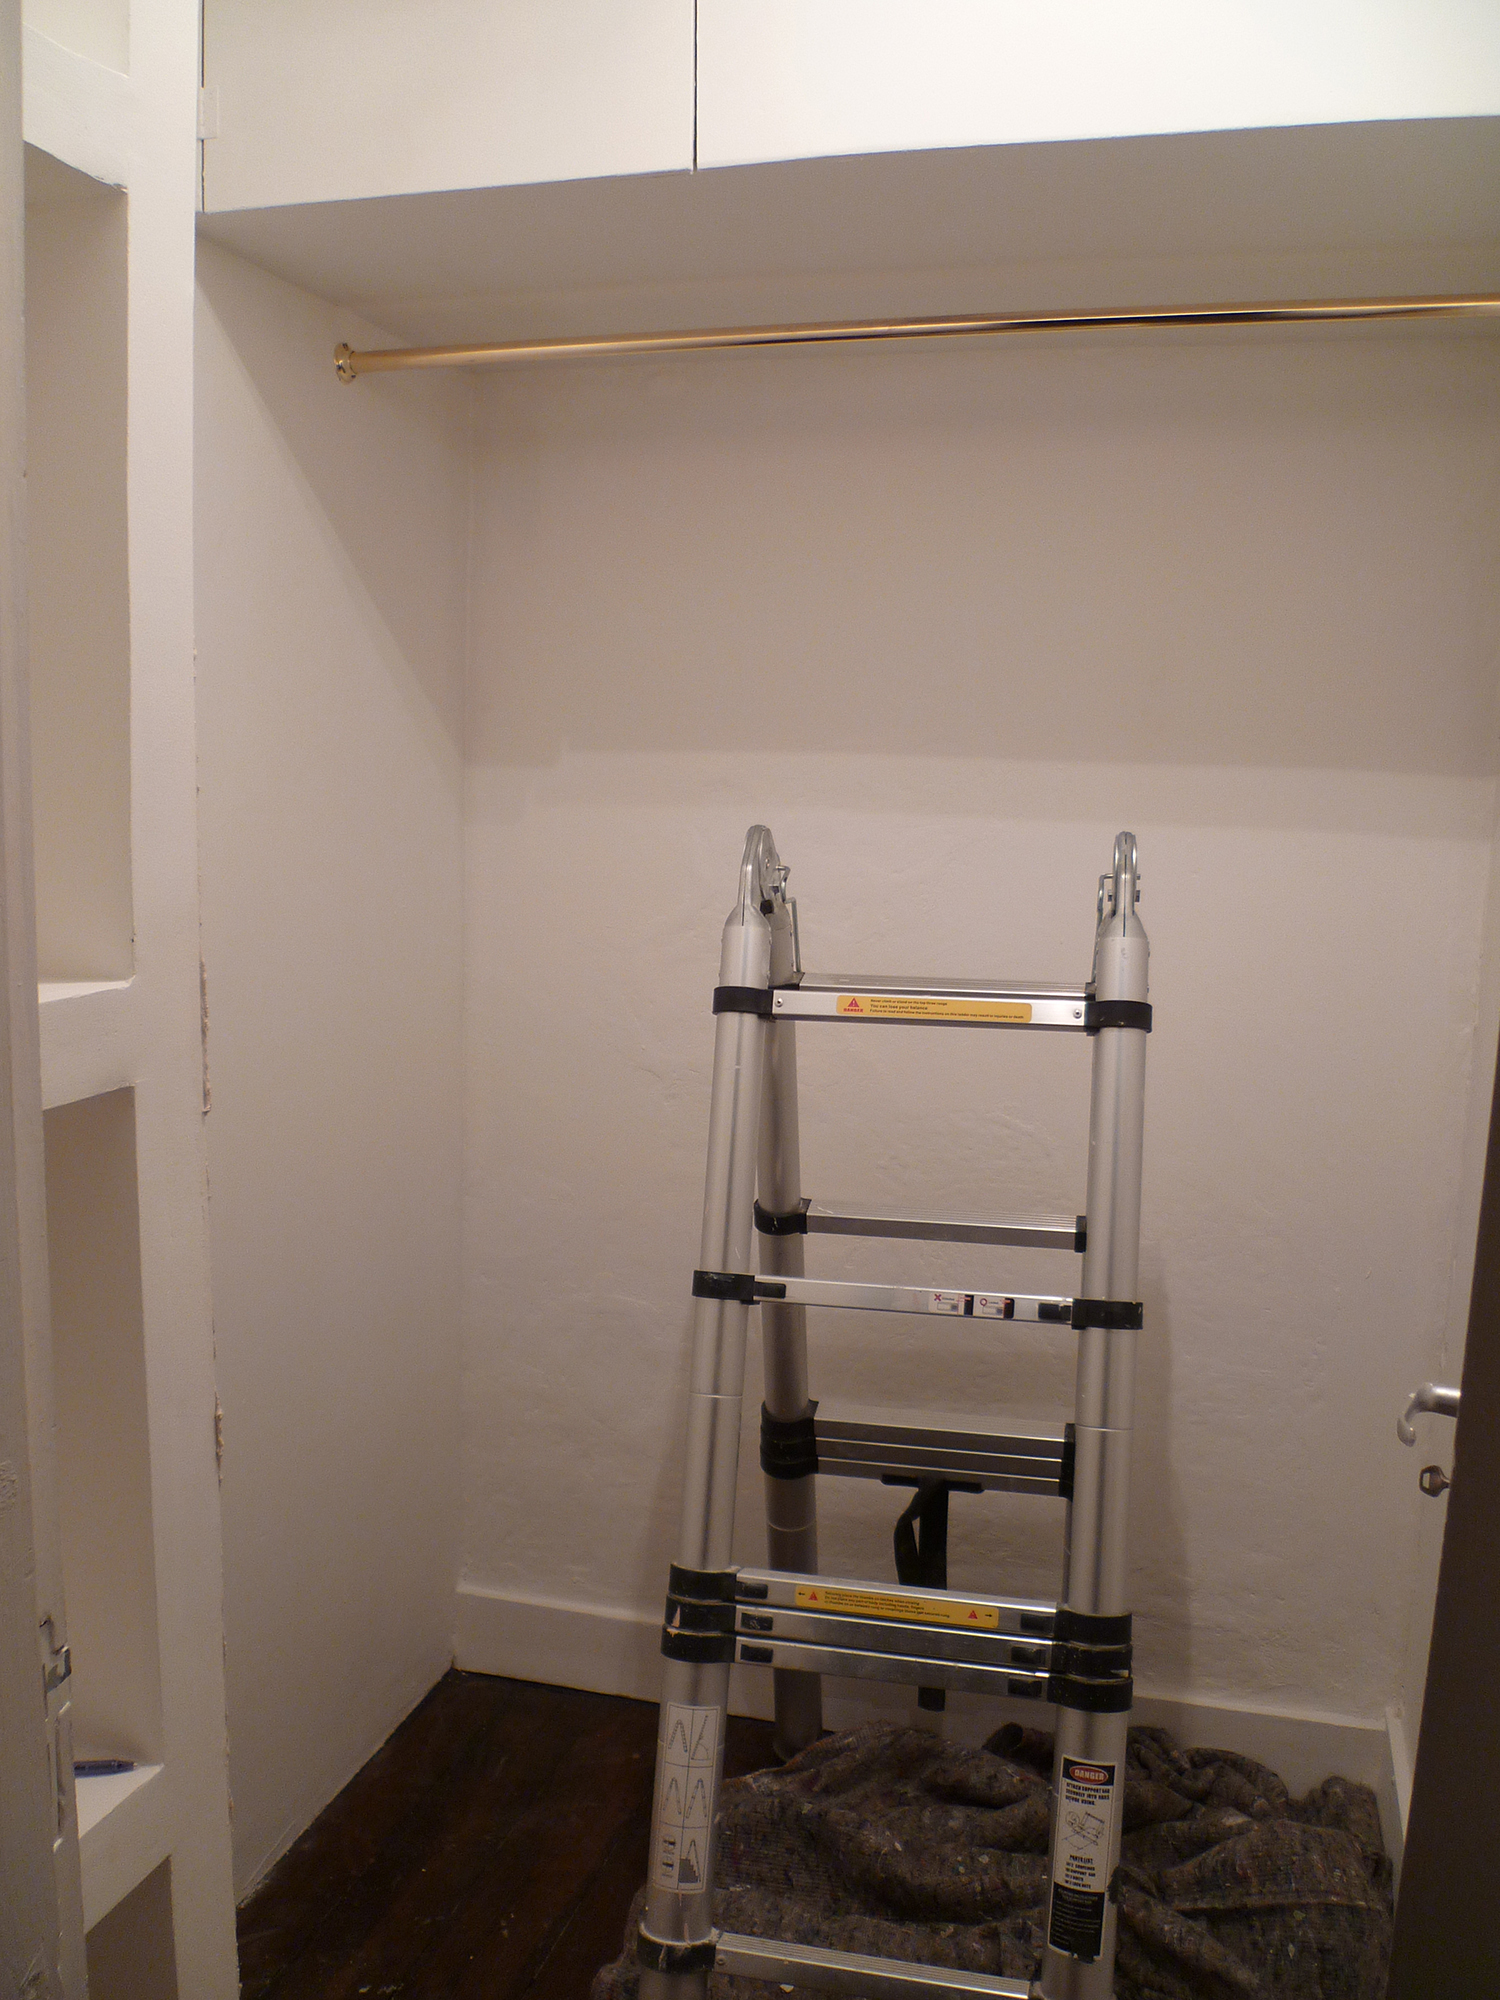 Preciously Me blog : One Room Challenge - Progress